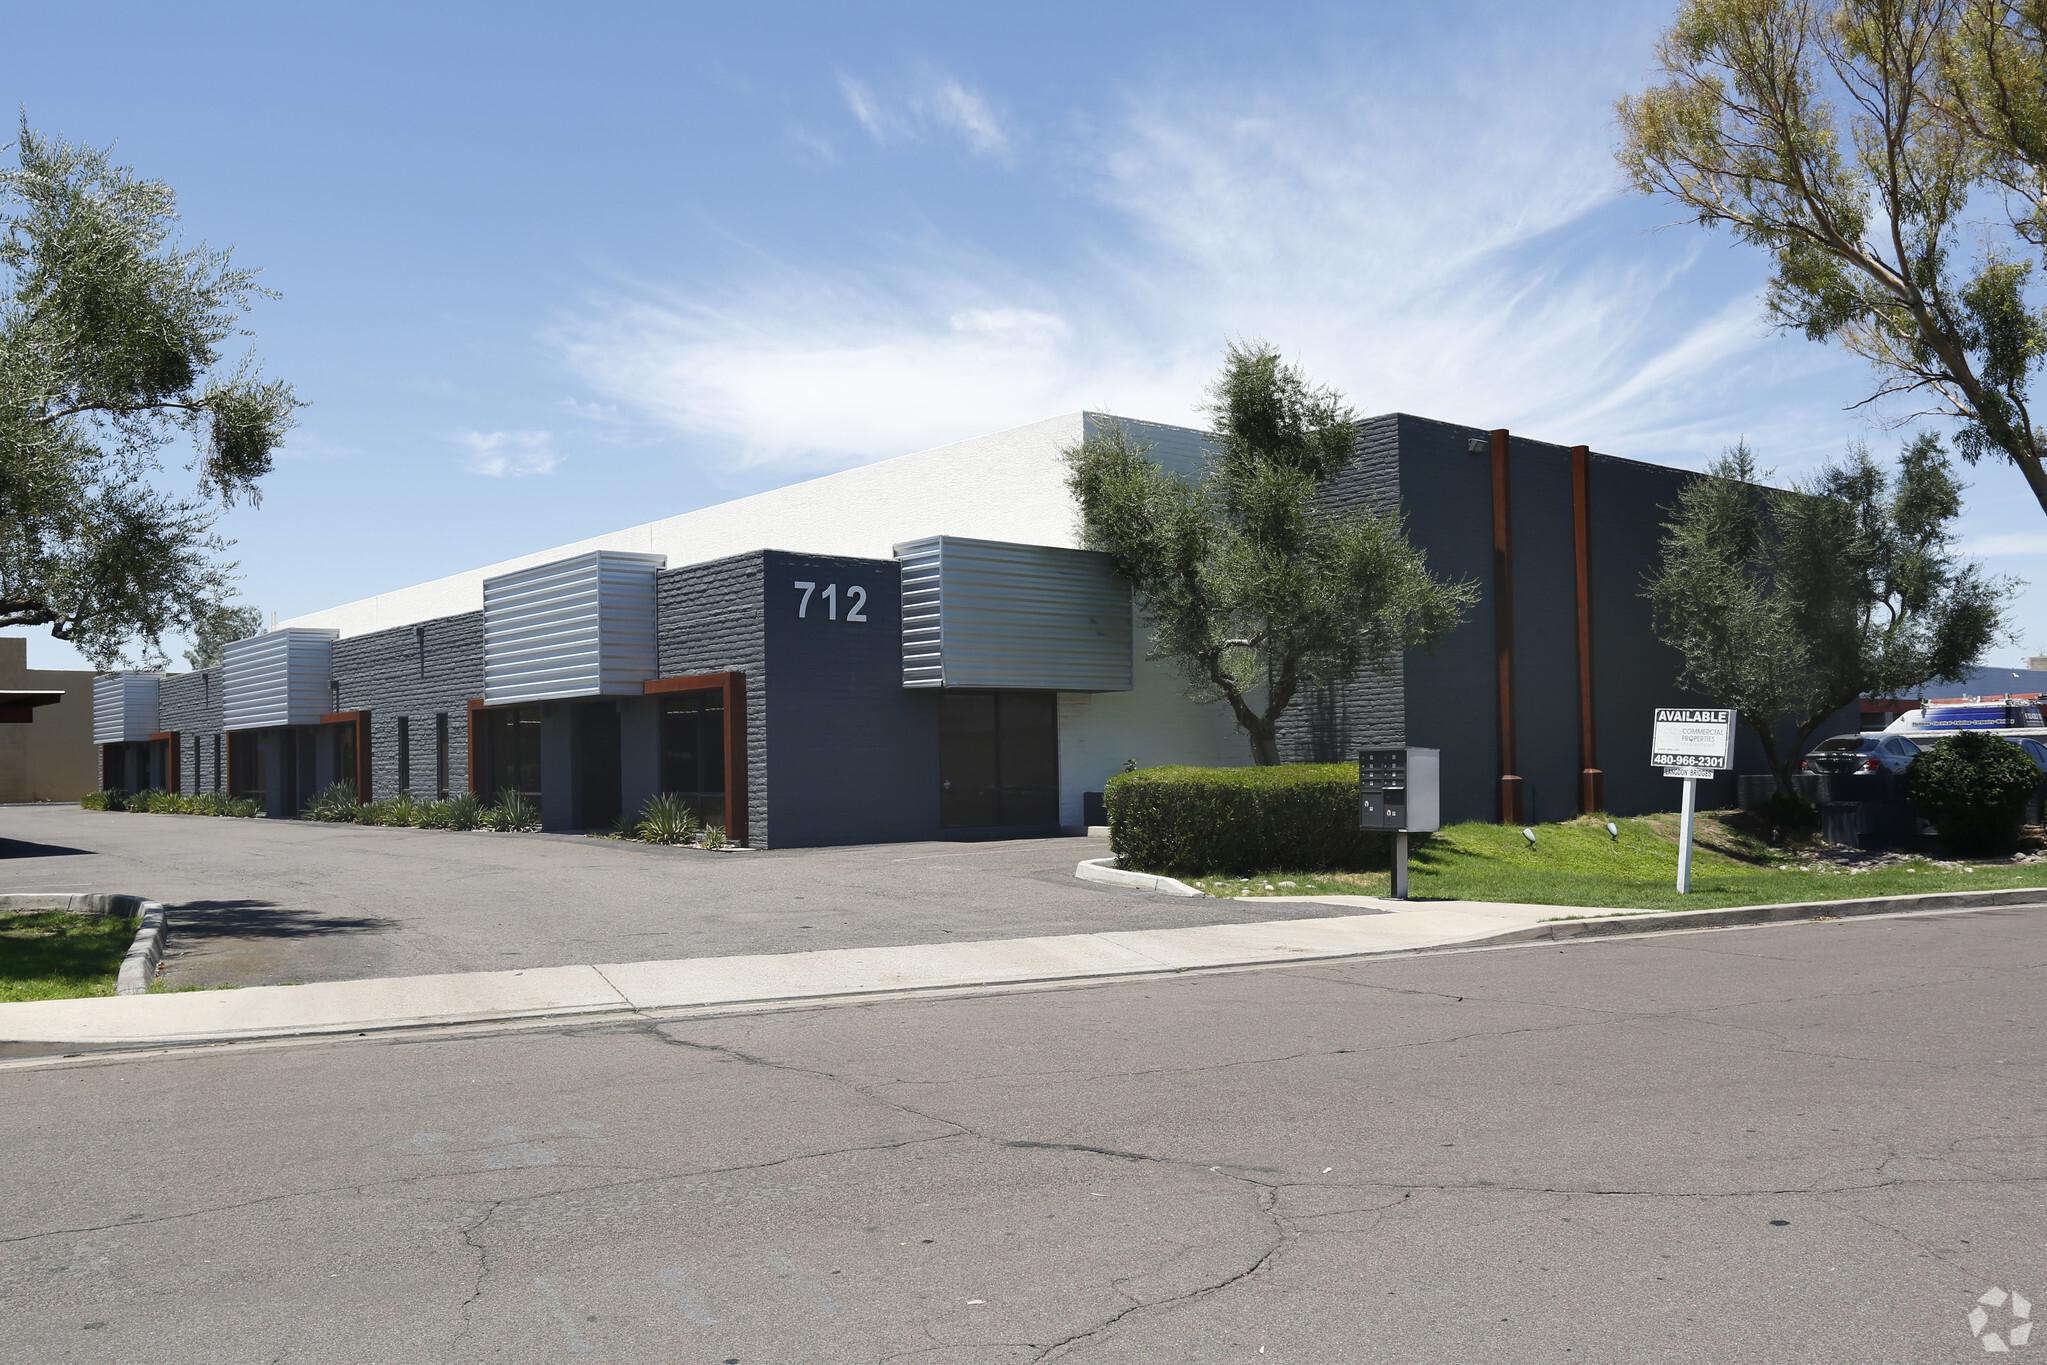 712 S Hacienda Dr, Tempe AZ 85281 Industrial Building